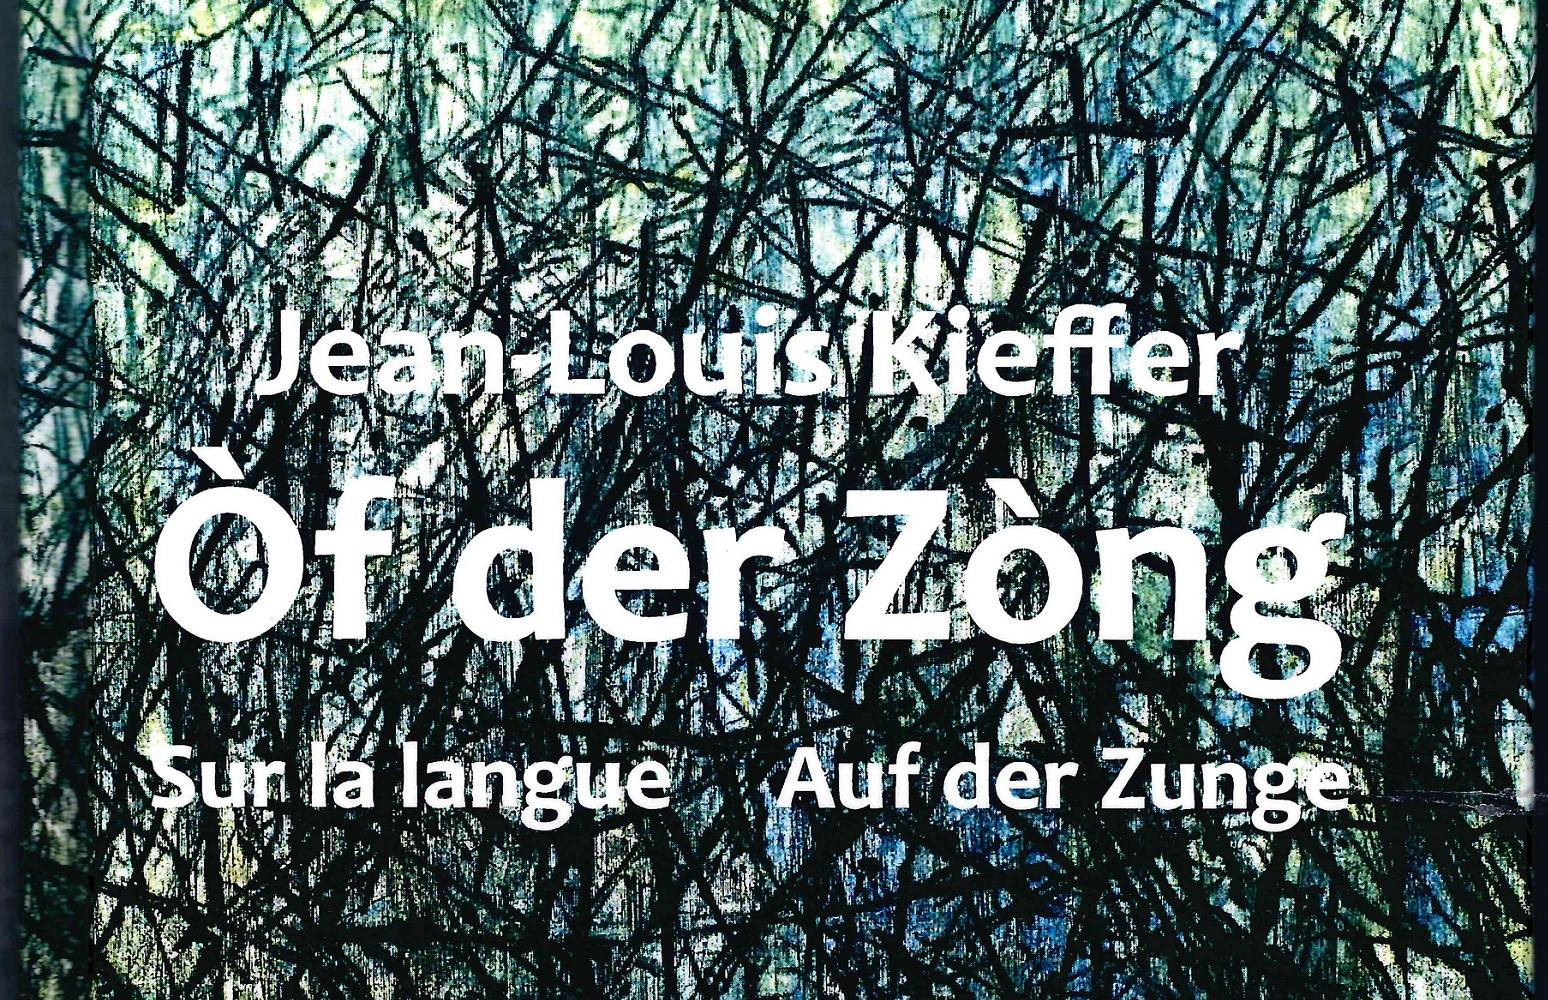 Lesung mit Jean-Louis Kieffer